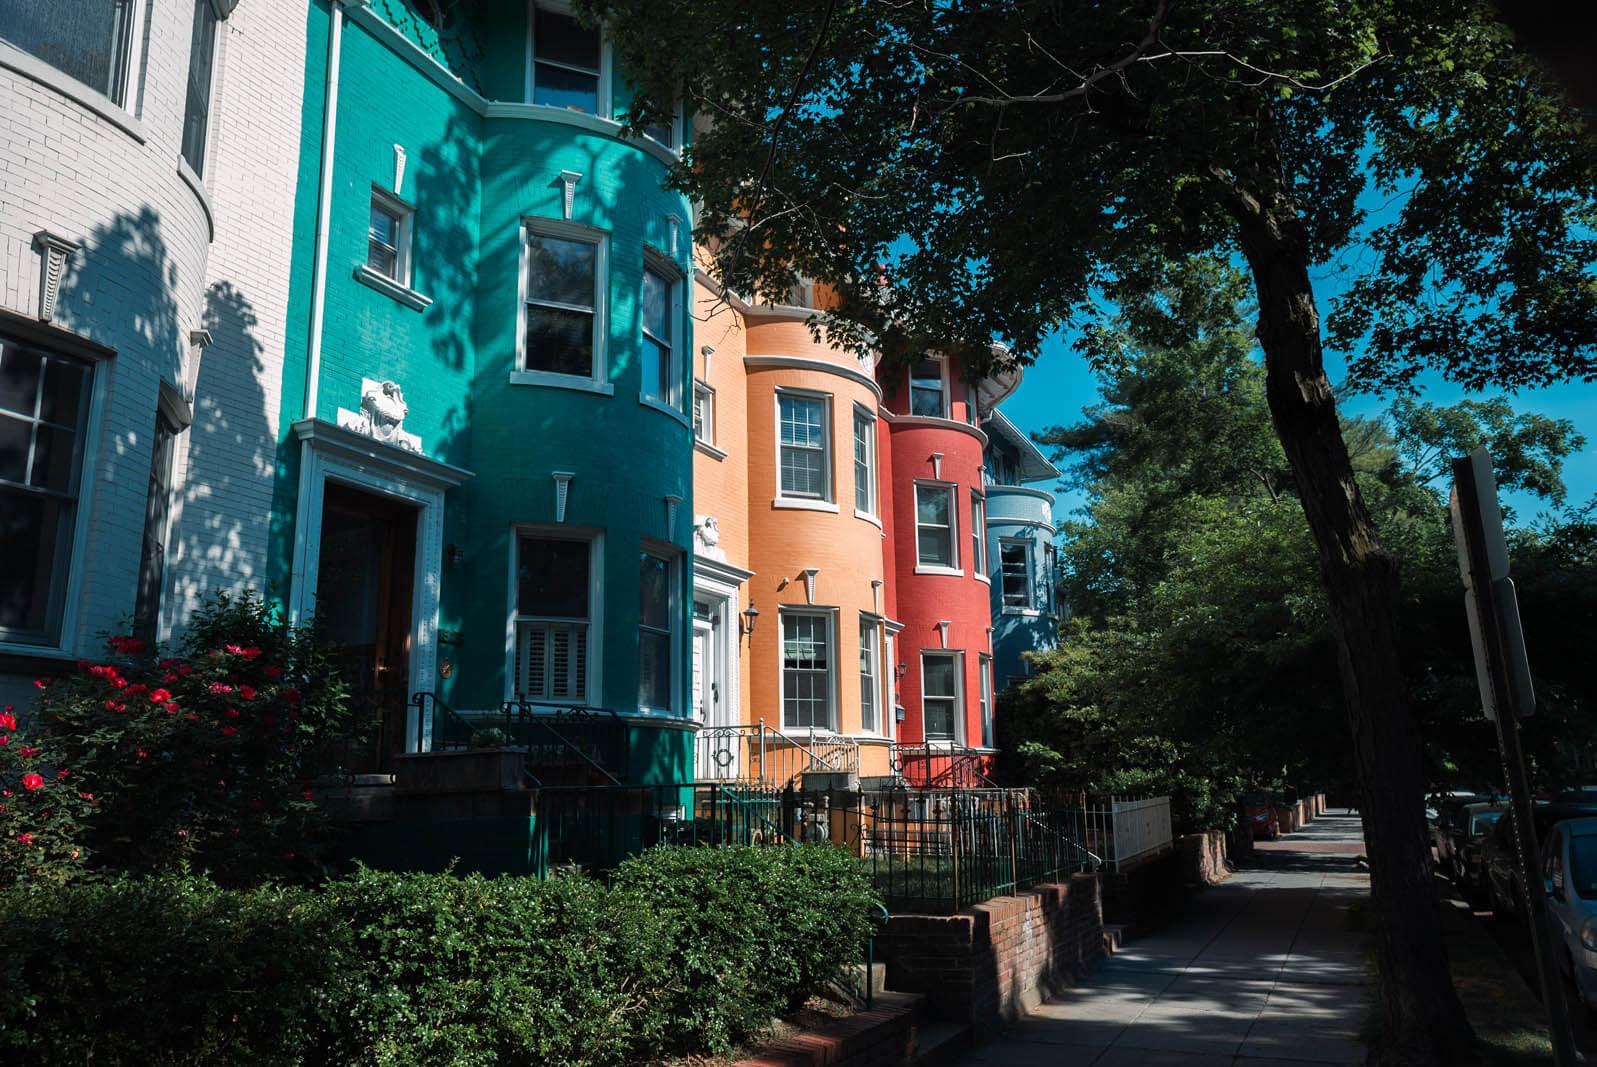 beautiful colorful homes of Adams Morgan neighborhood in Washington DC